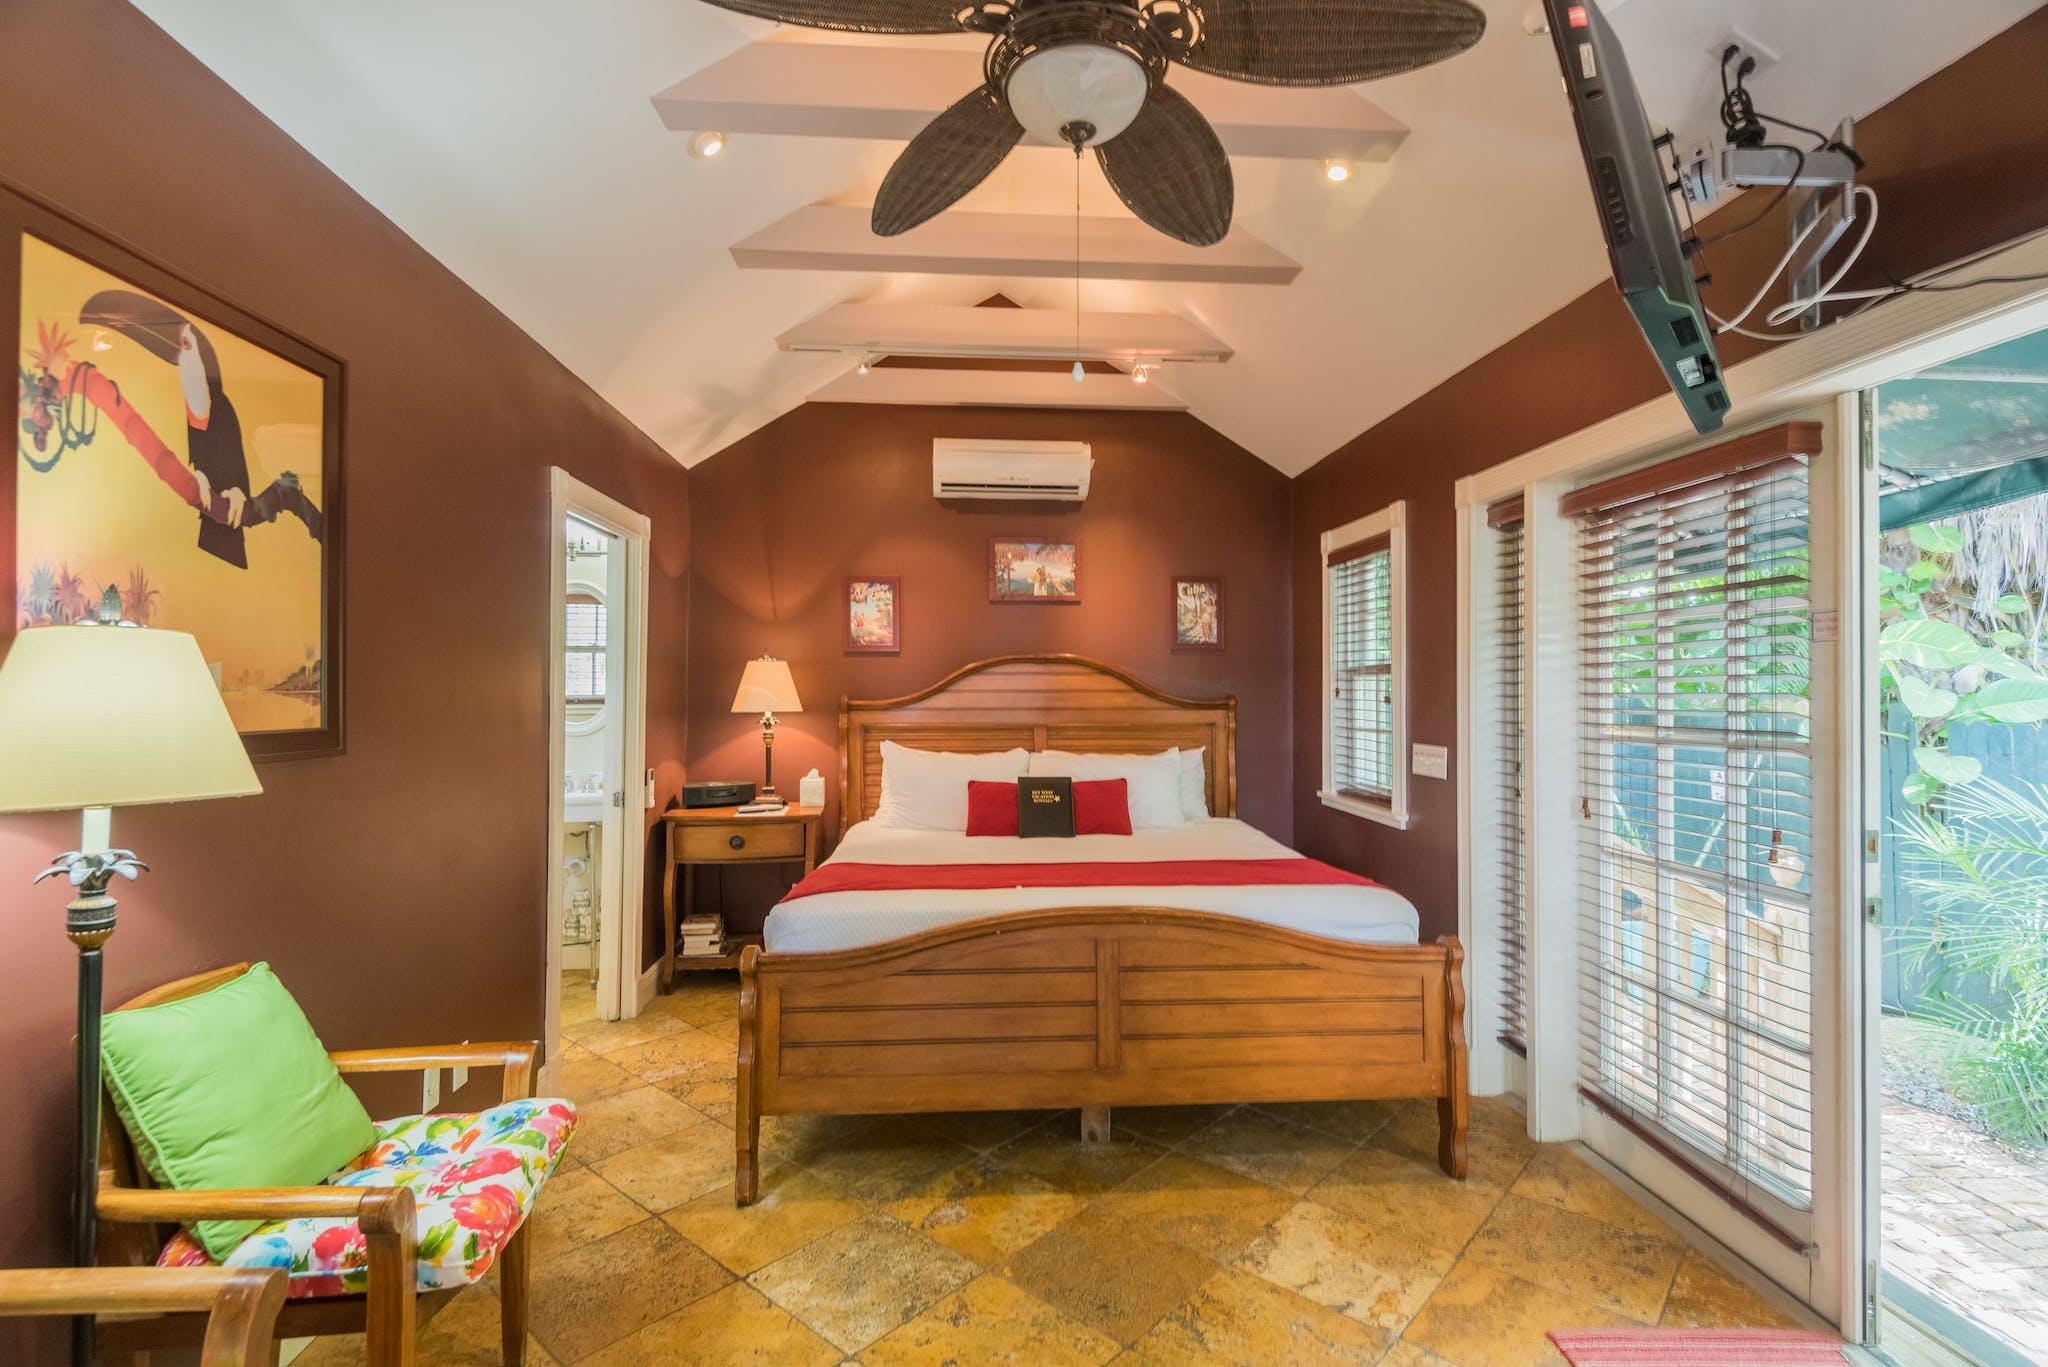 RENT Royal Palm - Nightly Rental | Key West Vacation Rental